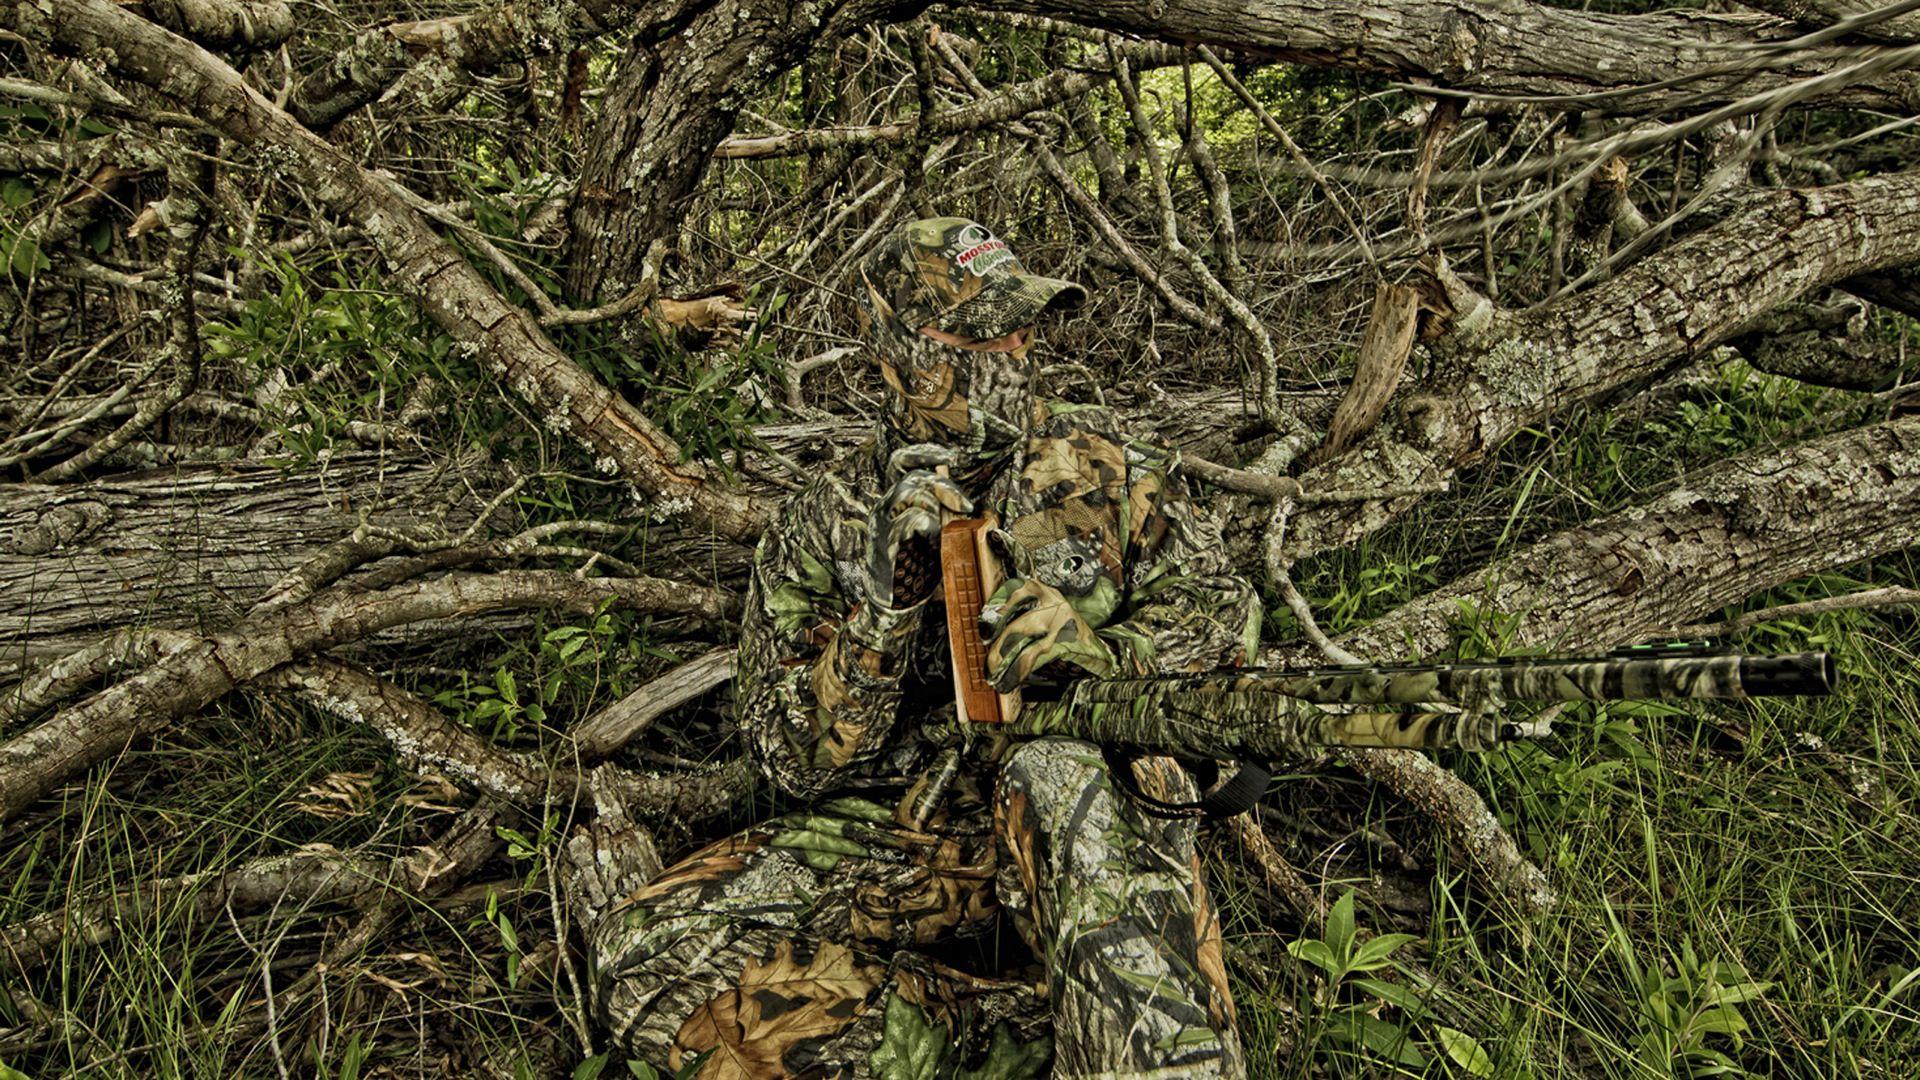 Spring Turkey Hunting Wallpaper Wallpapersafari